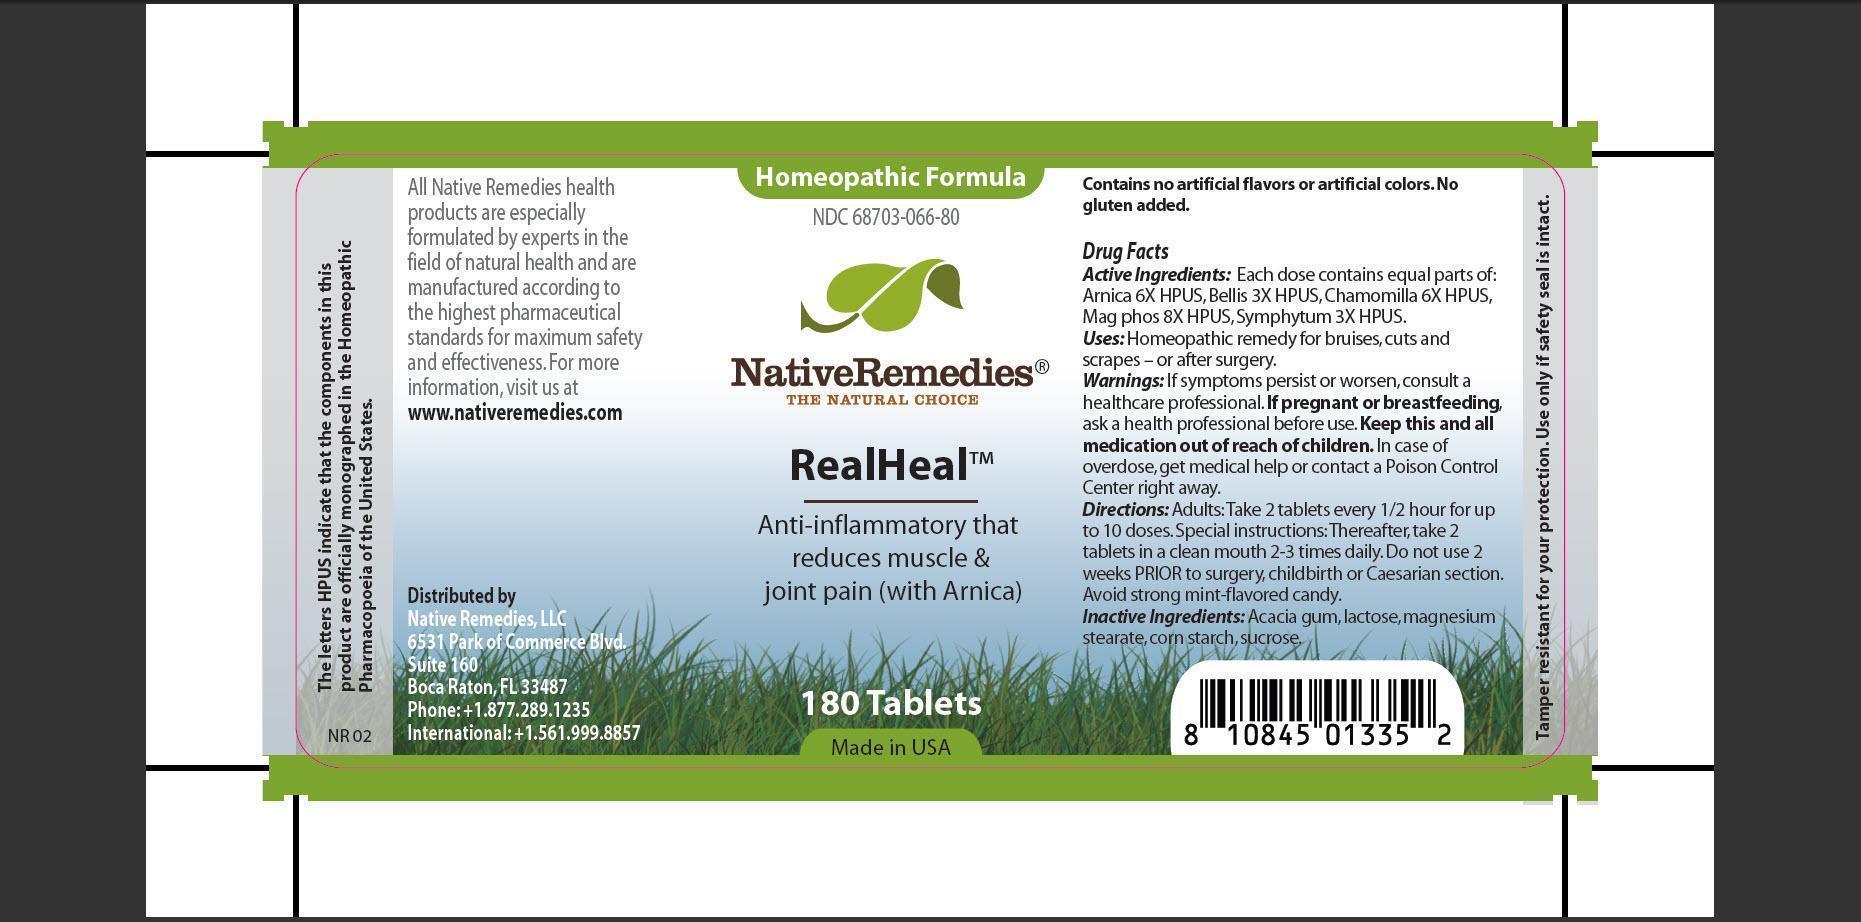 Realheal (Arnica, Bellis, Chamomilla, Mag Phos, Symphytum, Acacia Gum, Lactose, Magnesium Stearate, Corn Starch, Sucrose) Tablet [Native Remedies, Llc]